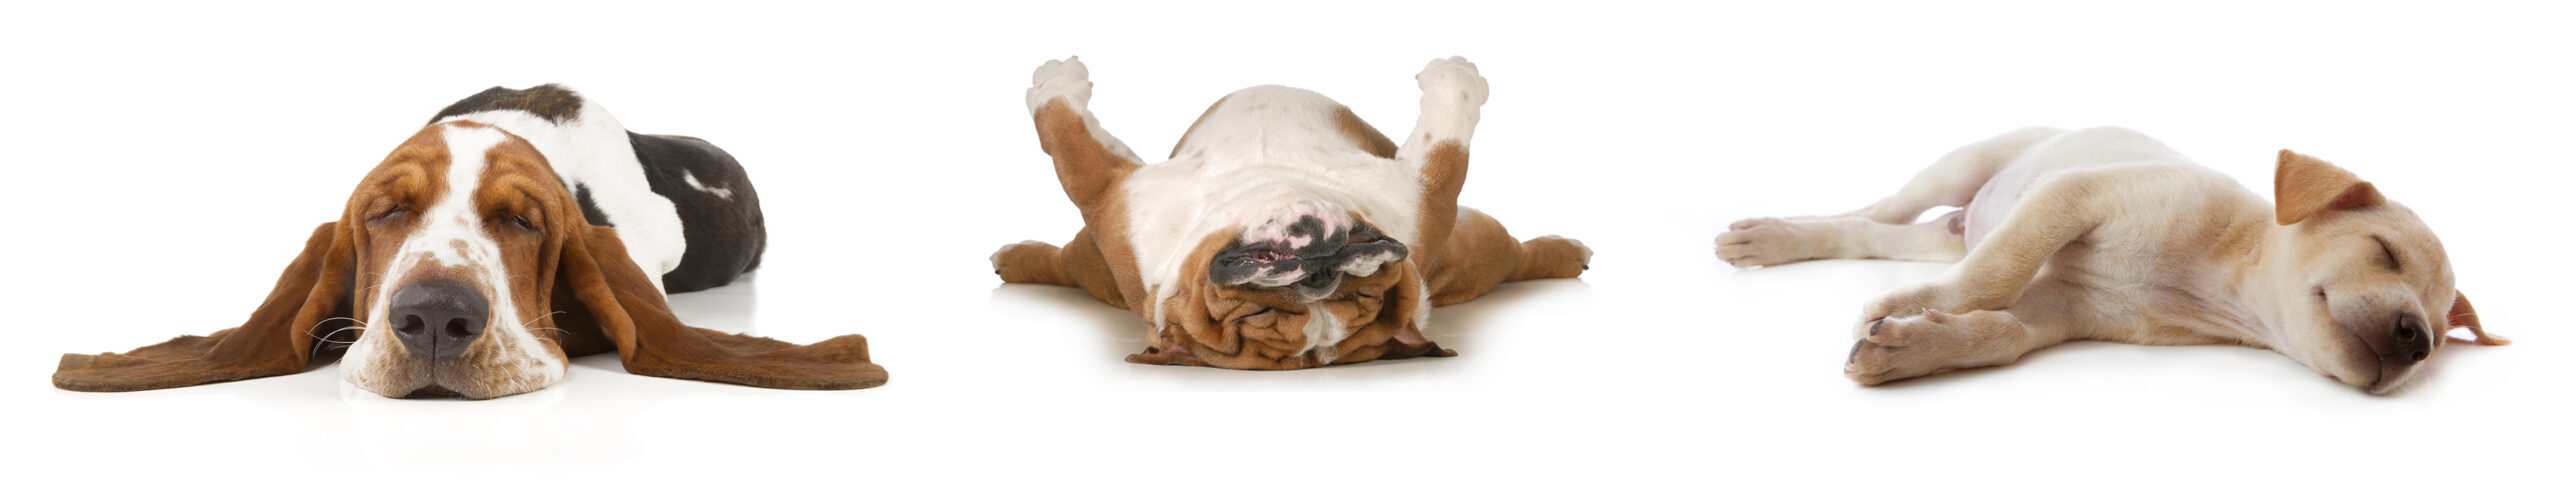 Sleep | Dog beds handmade in the UK